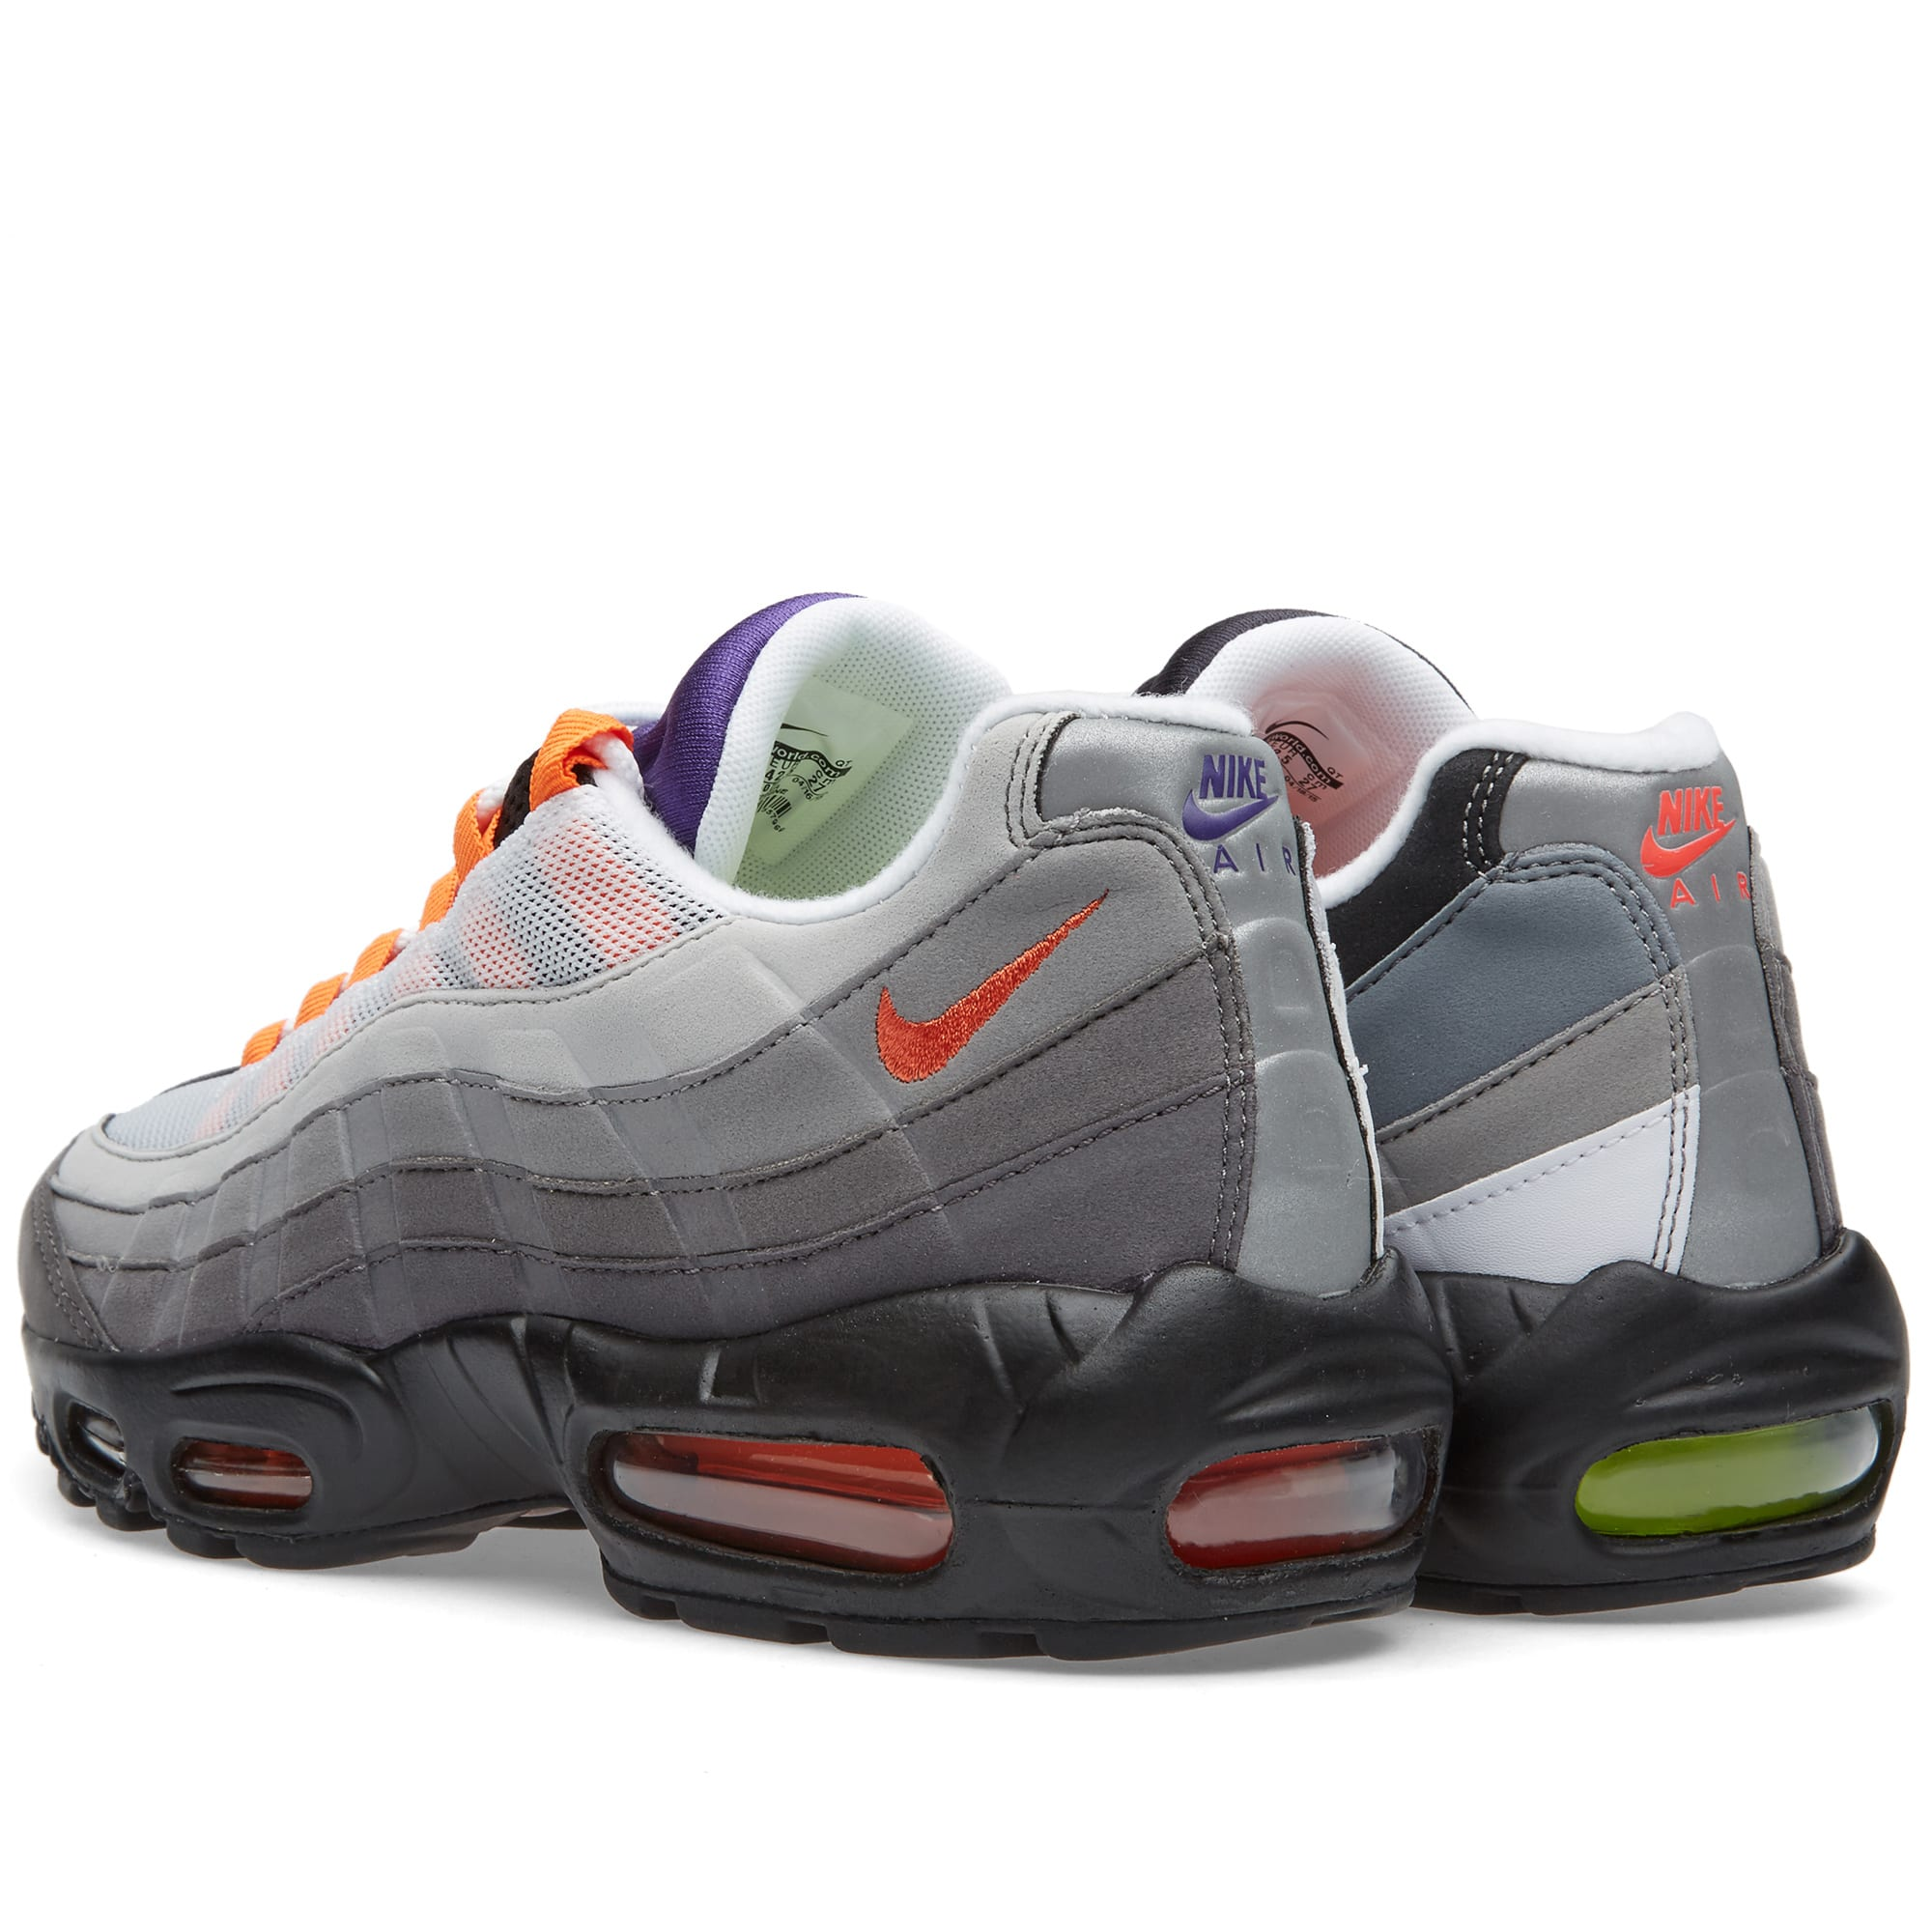 pretty nice 93963 92fee Nike Air Max 95 OG QS 'Greedy'